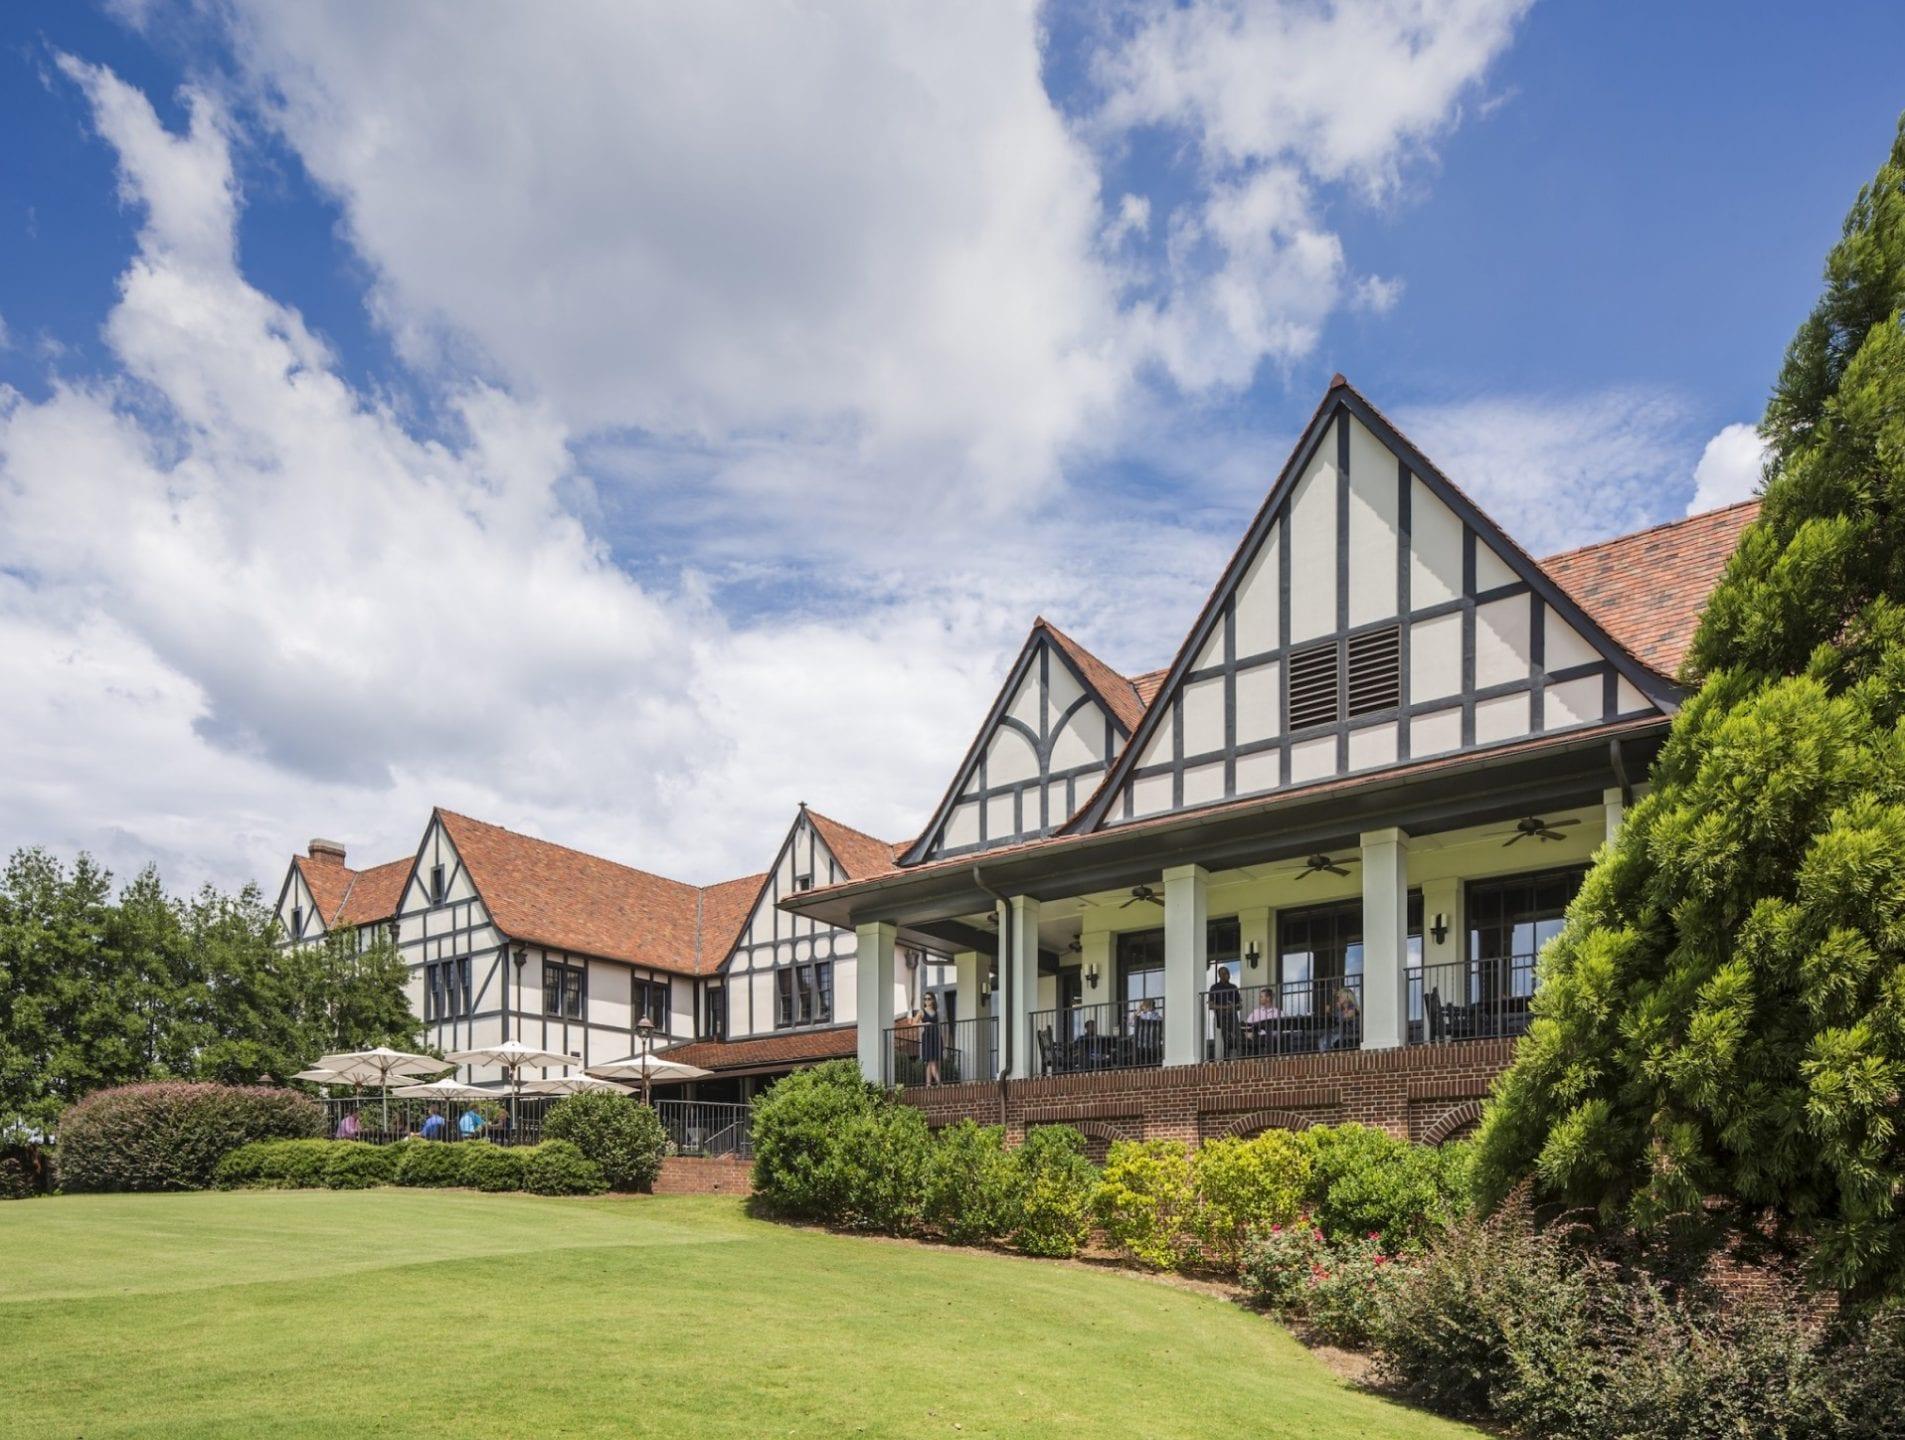 East Lake Golf Club Ludowici Roof Tile